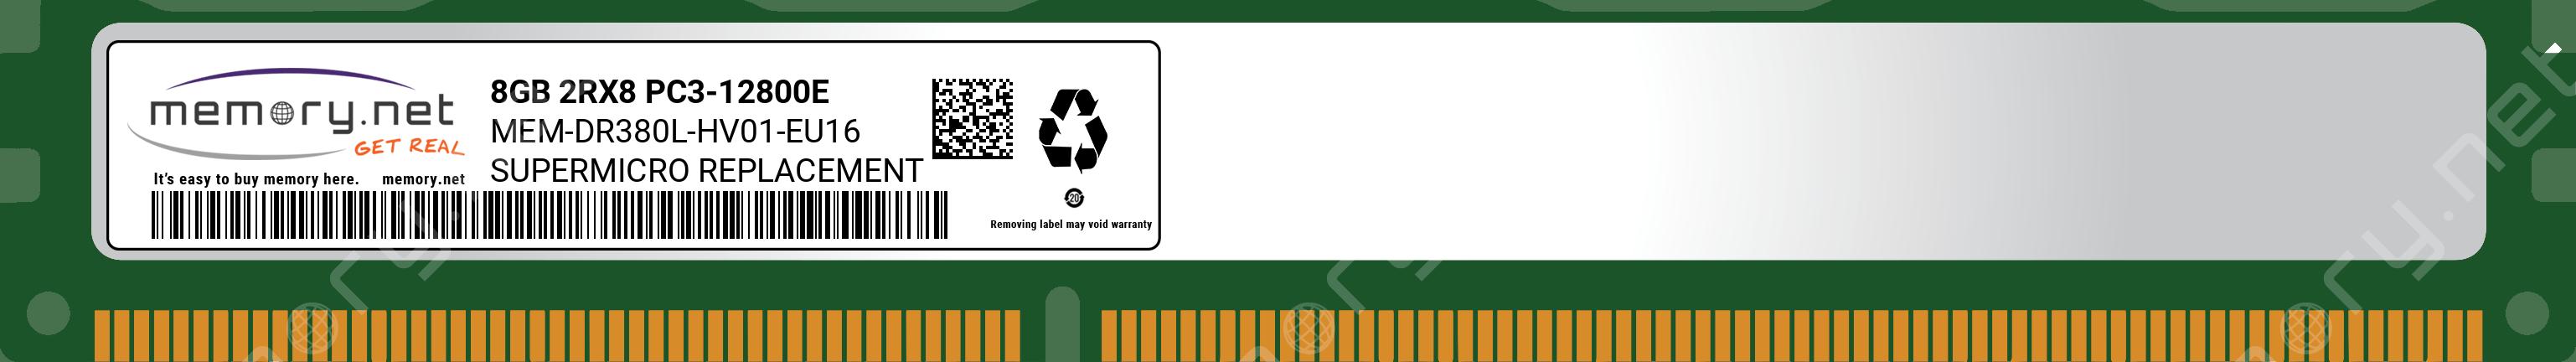 MEM-DR380L-HV01-EU16